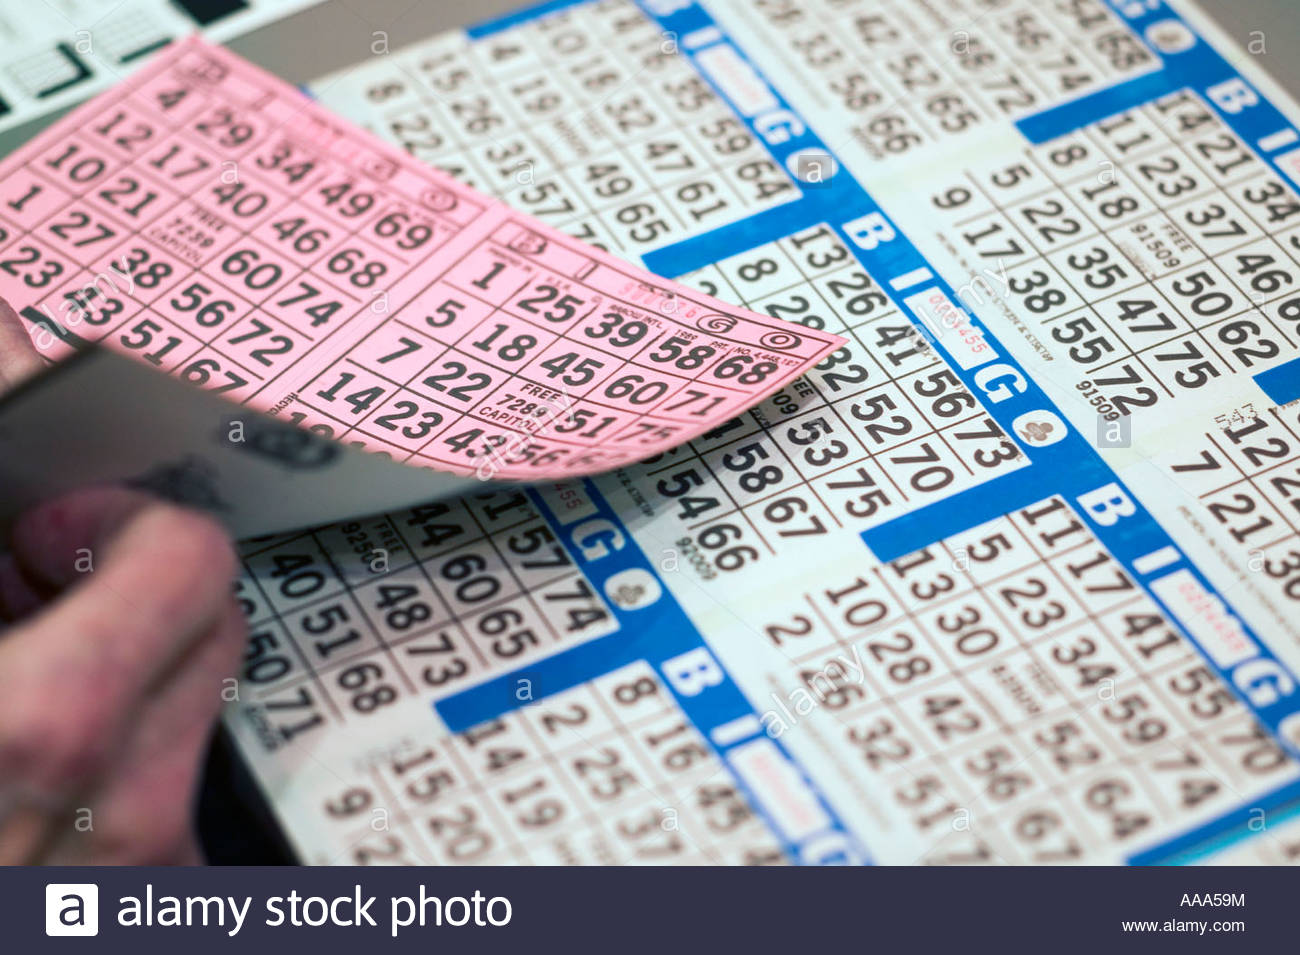 Bingo cards - Stock Image